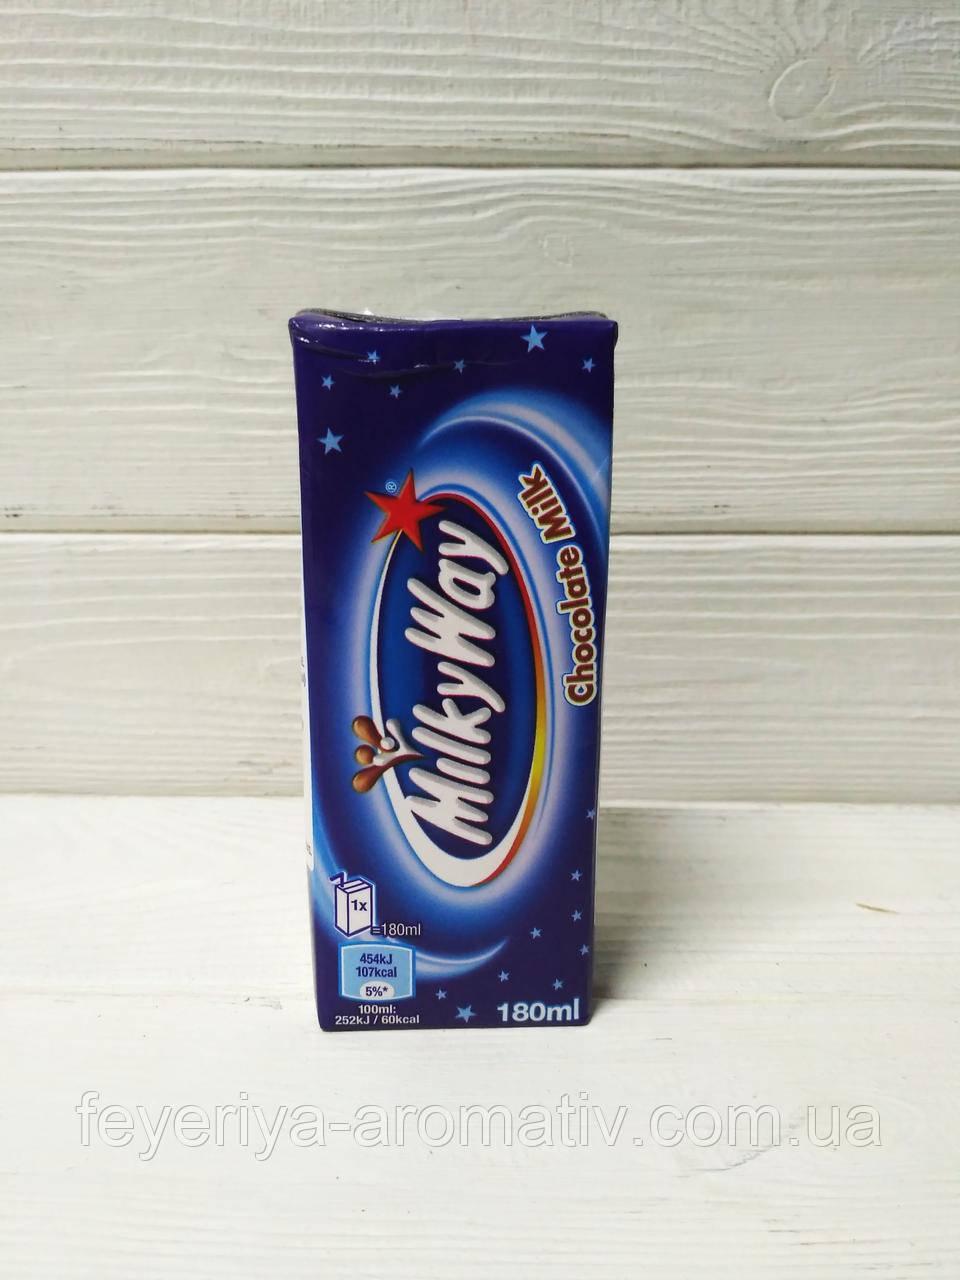 Молочный коктейль Milky Way Chocolate Milk 180ml (Великобритания)